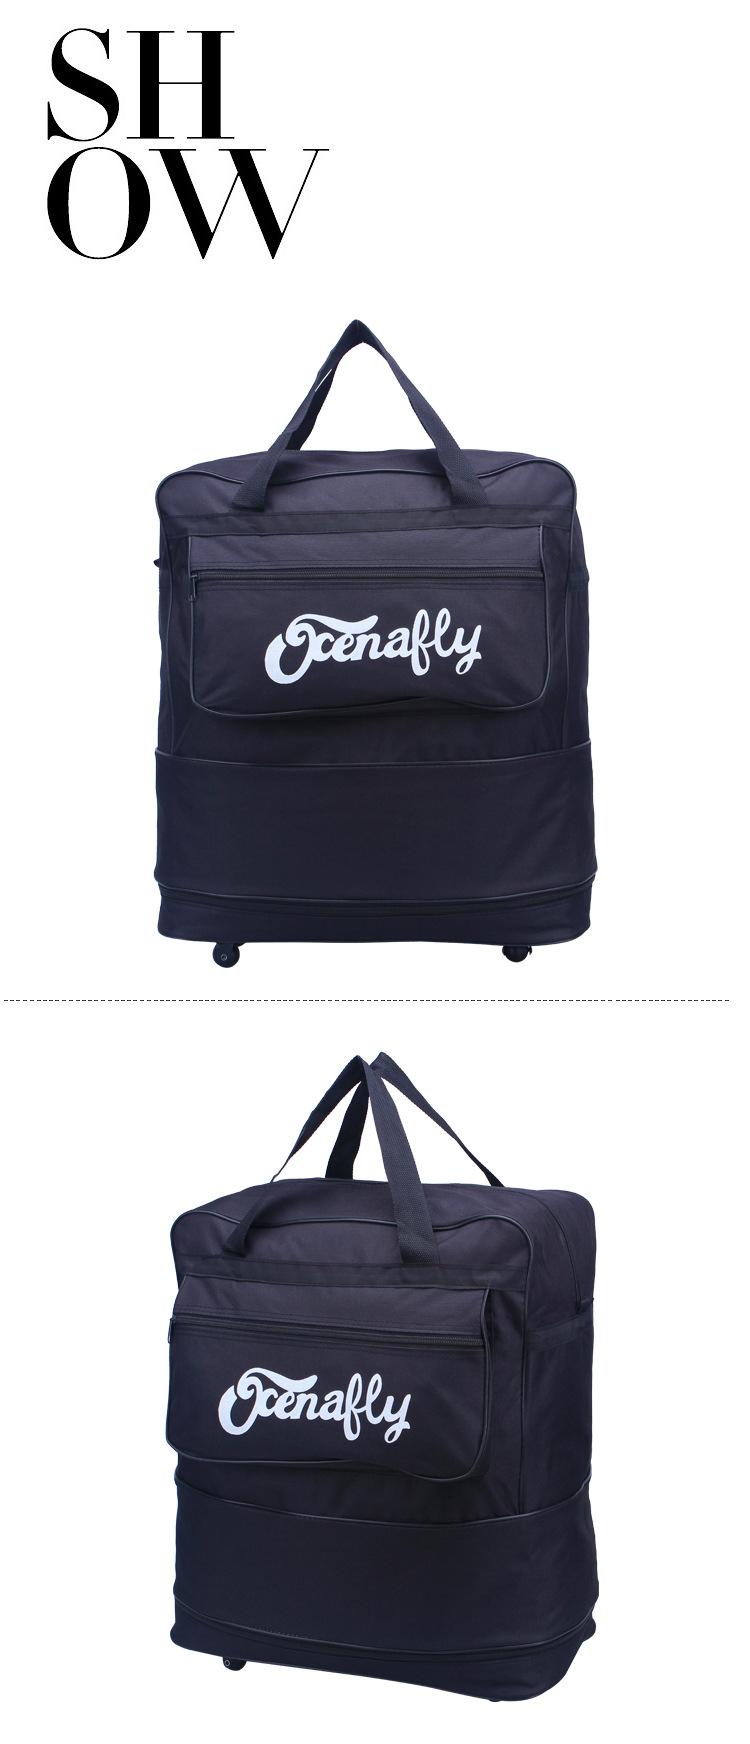 Travel Bag Rolling Weekend Luggage